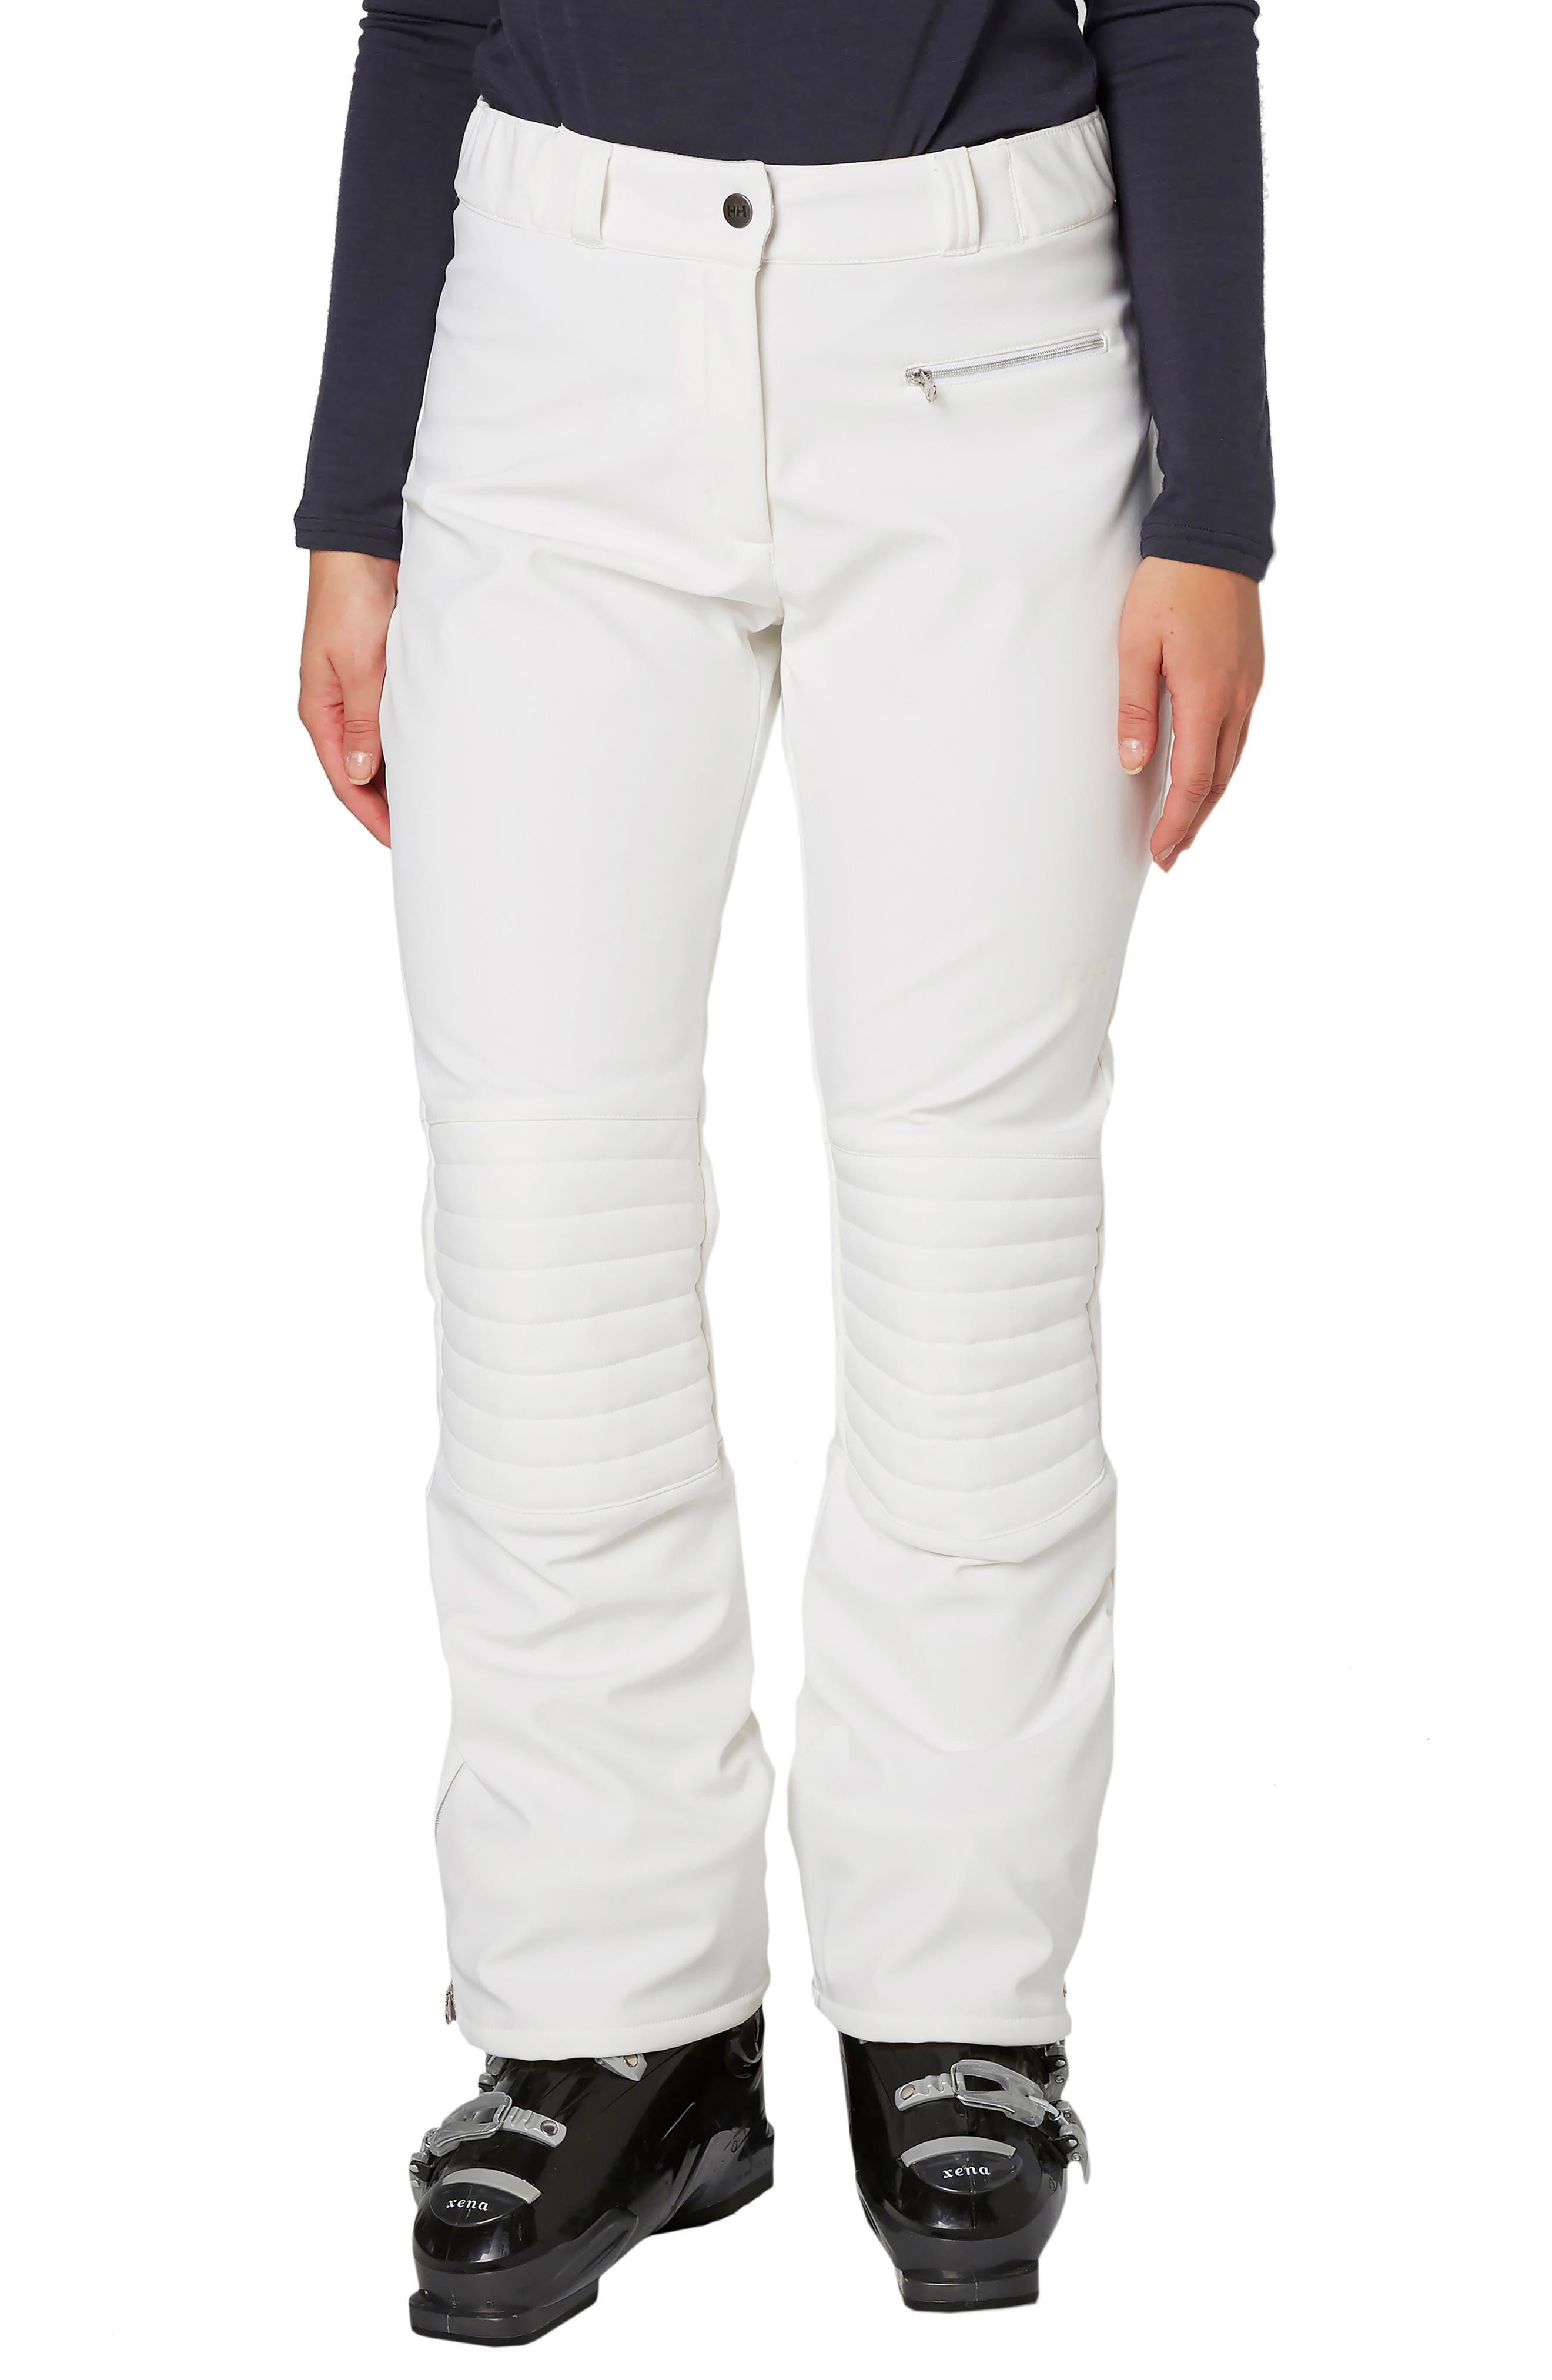 Bellissimo Ski Pants,                             Main thumbnail 1, color,                             100